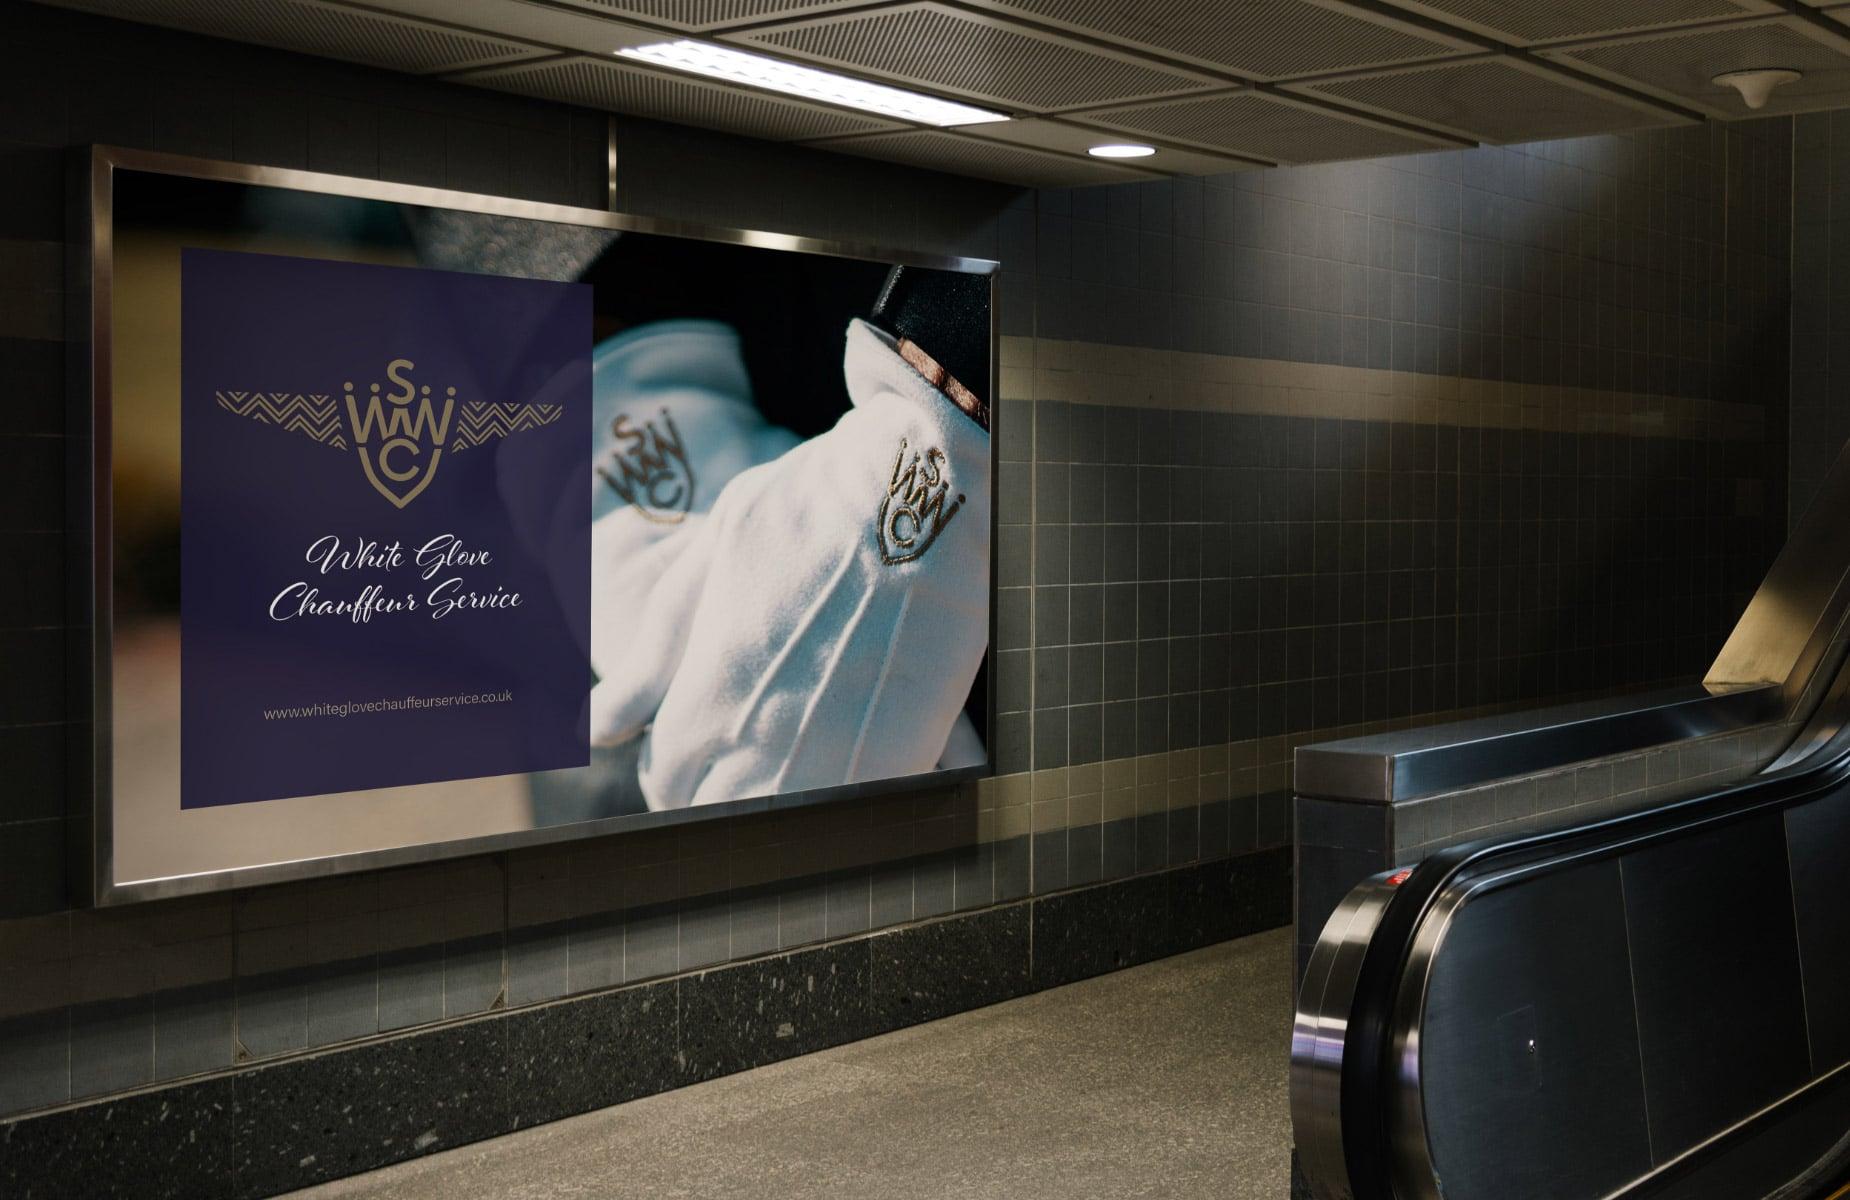 WP Creative, Design and Marketing Agency Suffolk, Digital Design, Company Advertising Example, Escalator Poster